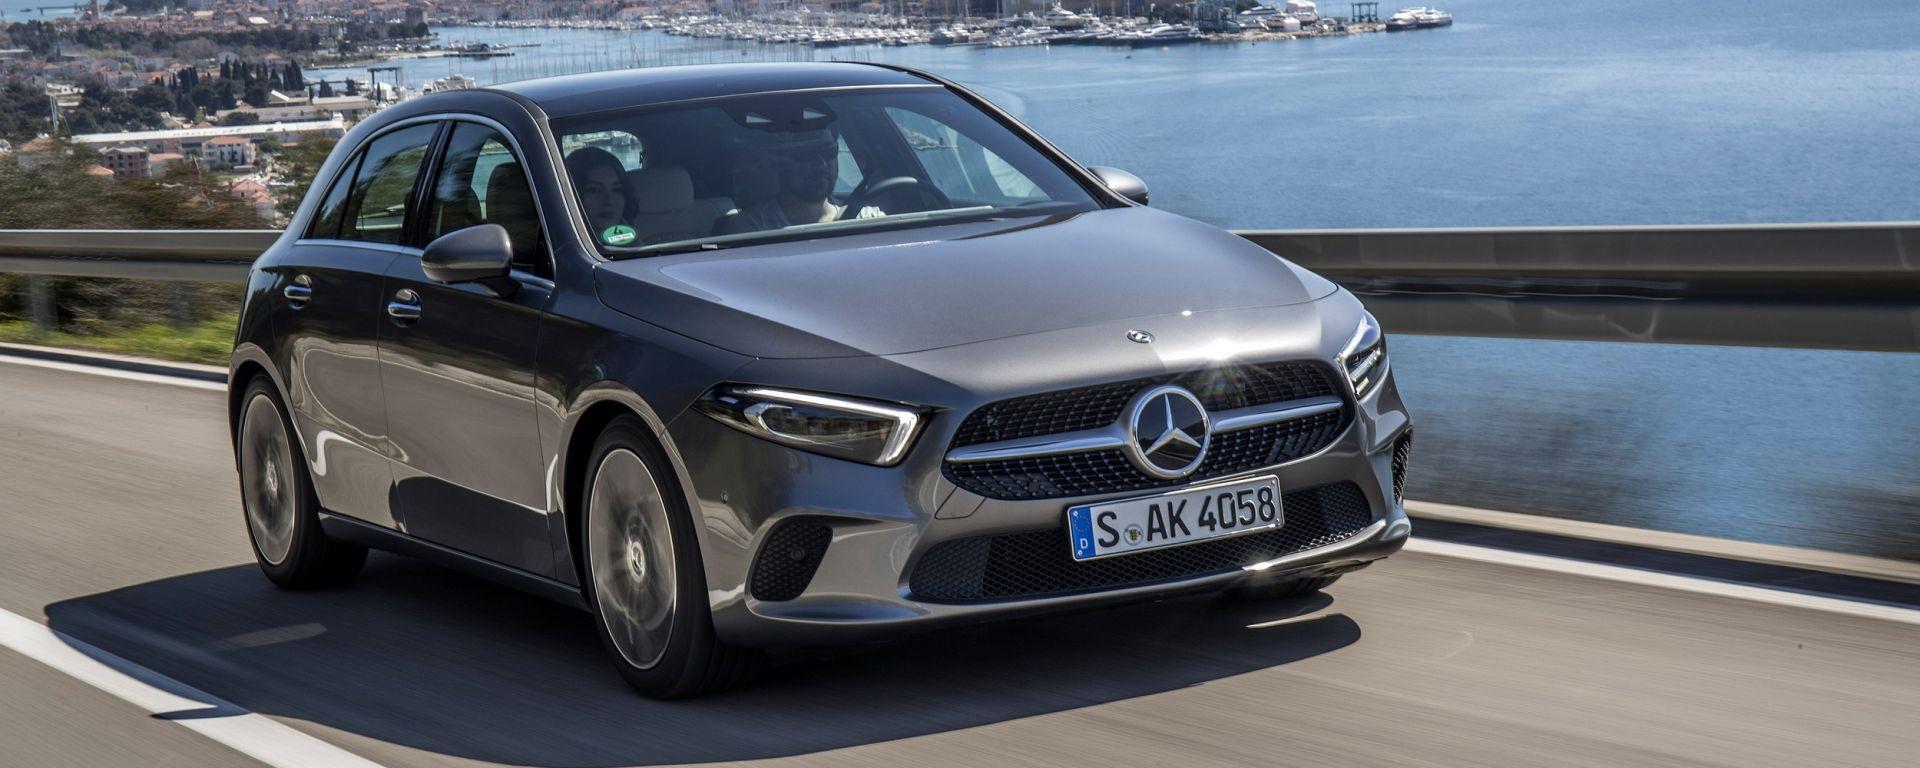 Mercedes Classe A: 5 Stelle Euro NCAP, come Mazda6 e Nexo